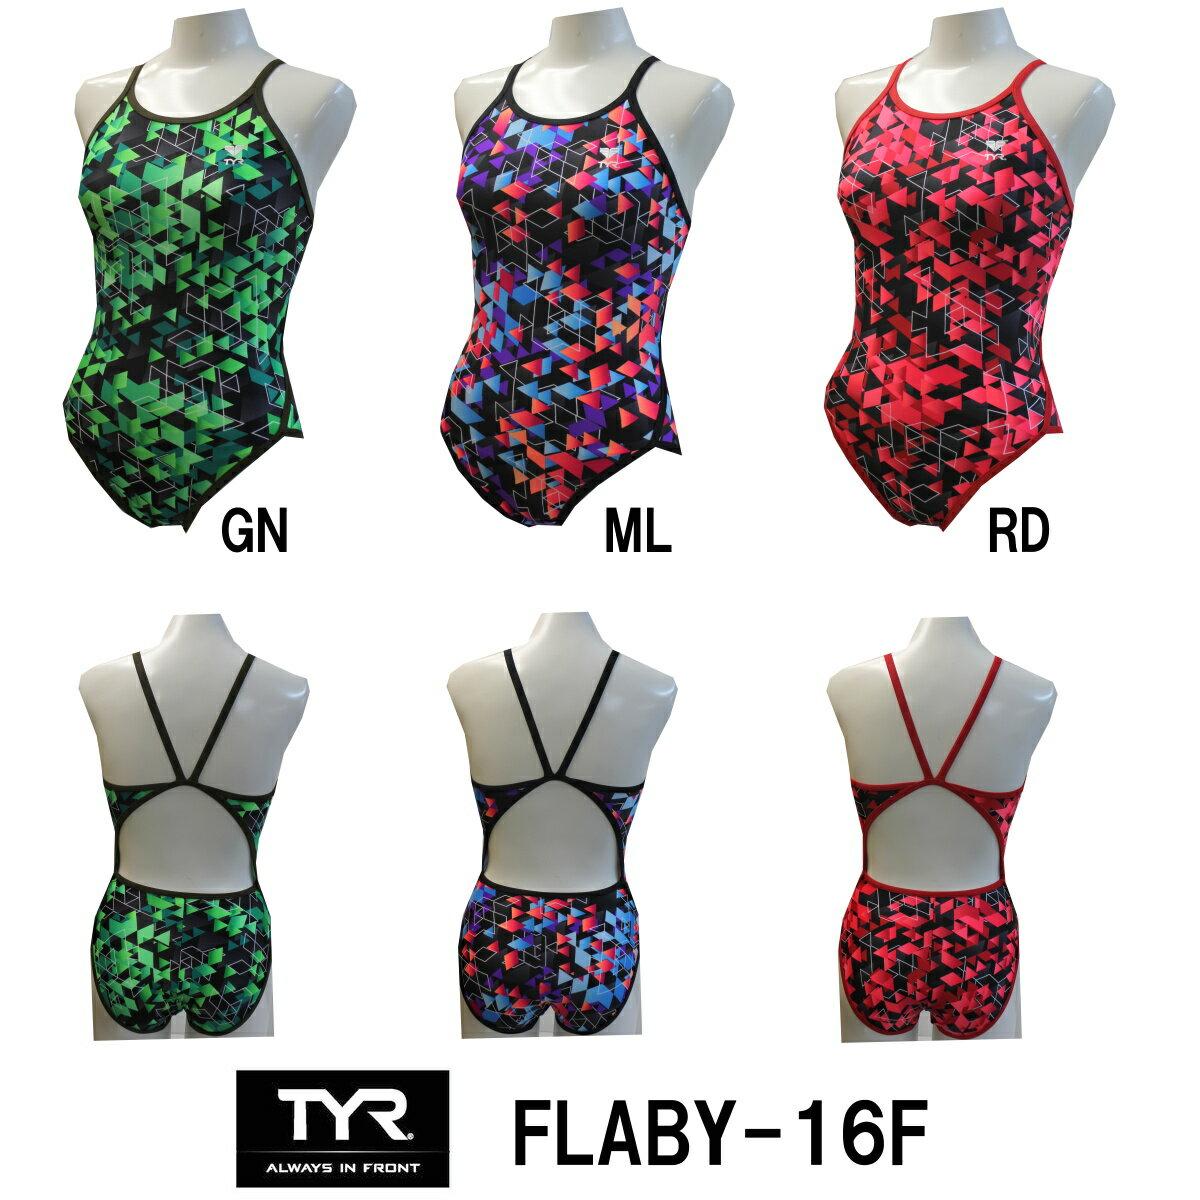 【FLABY-16F】TYR(ティア)レディーストレーニング水着LABYRINTH(ラビリンス)ウィメンズフレックスバック[練習用水着/ワンピース/女性用]